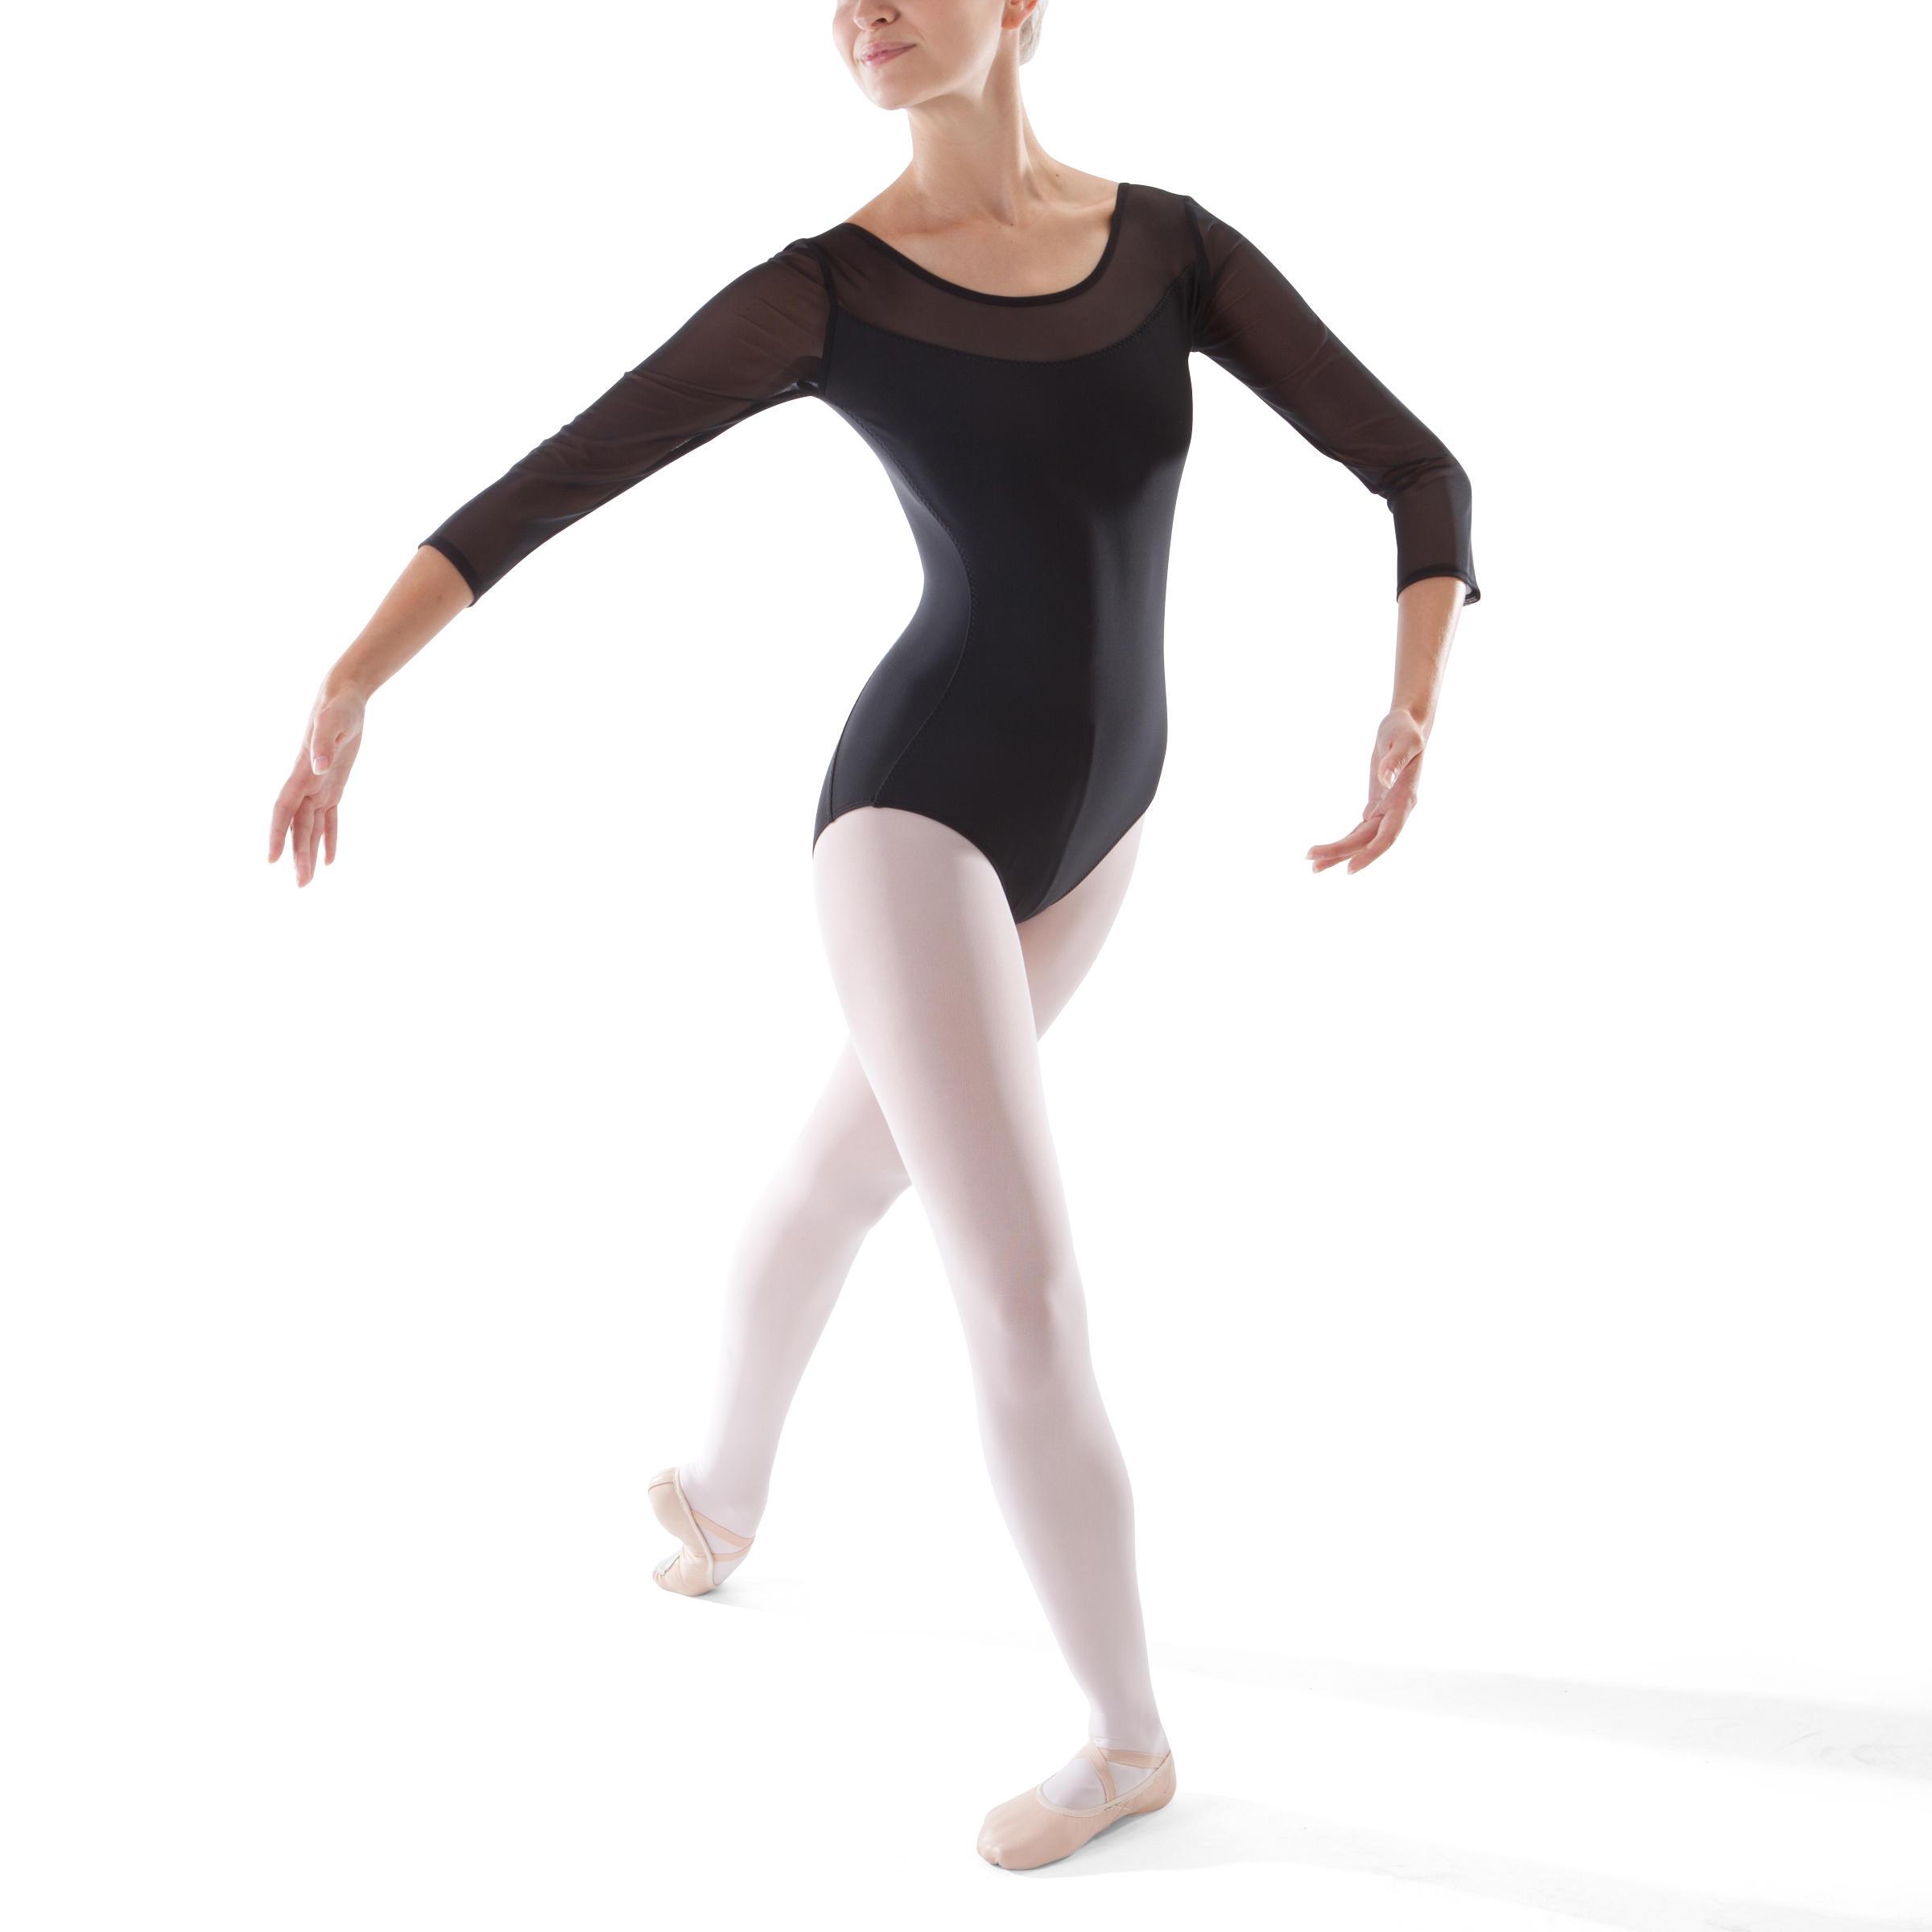 Leotardo de danza clásica de dos materiales manga larga mujer negro